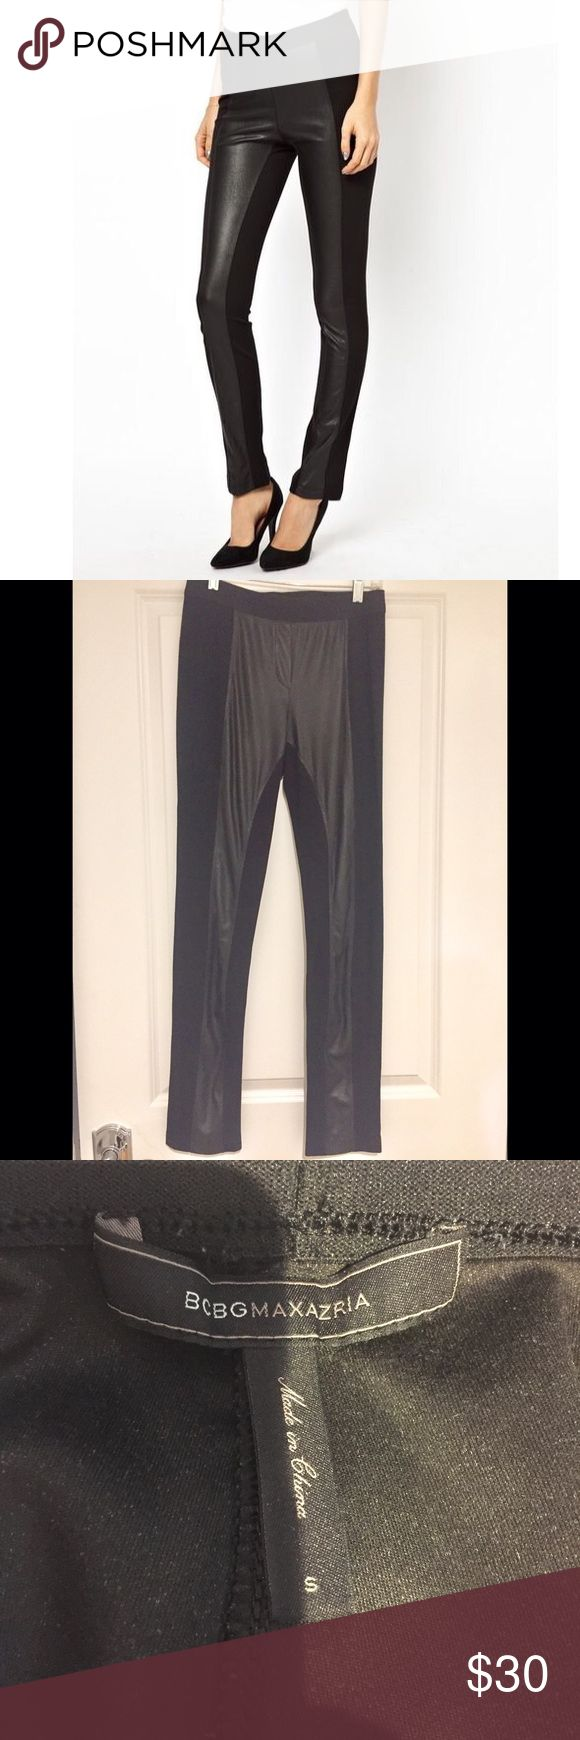 BCBG faux leather panel leggings BCBG faux leather panel leggings. Size small. BCBGMaxAzria Pants Leggings